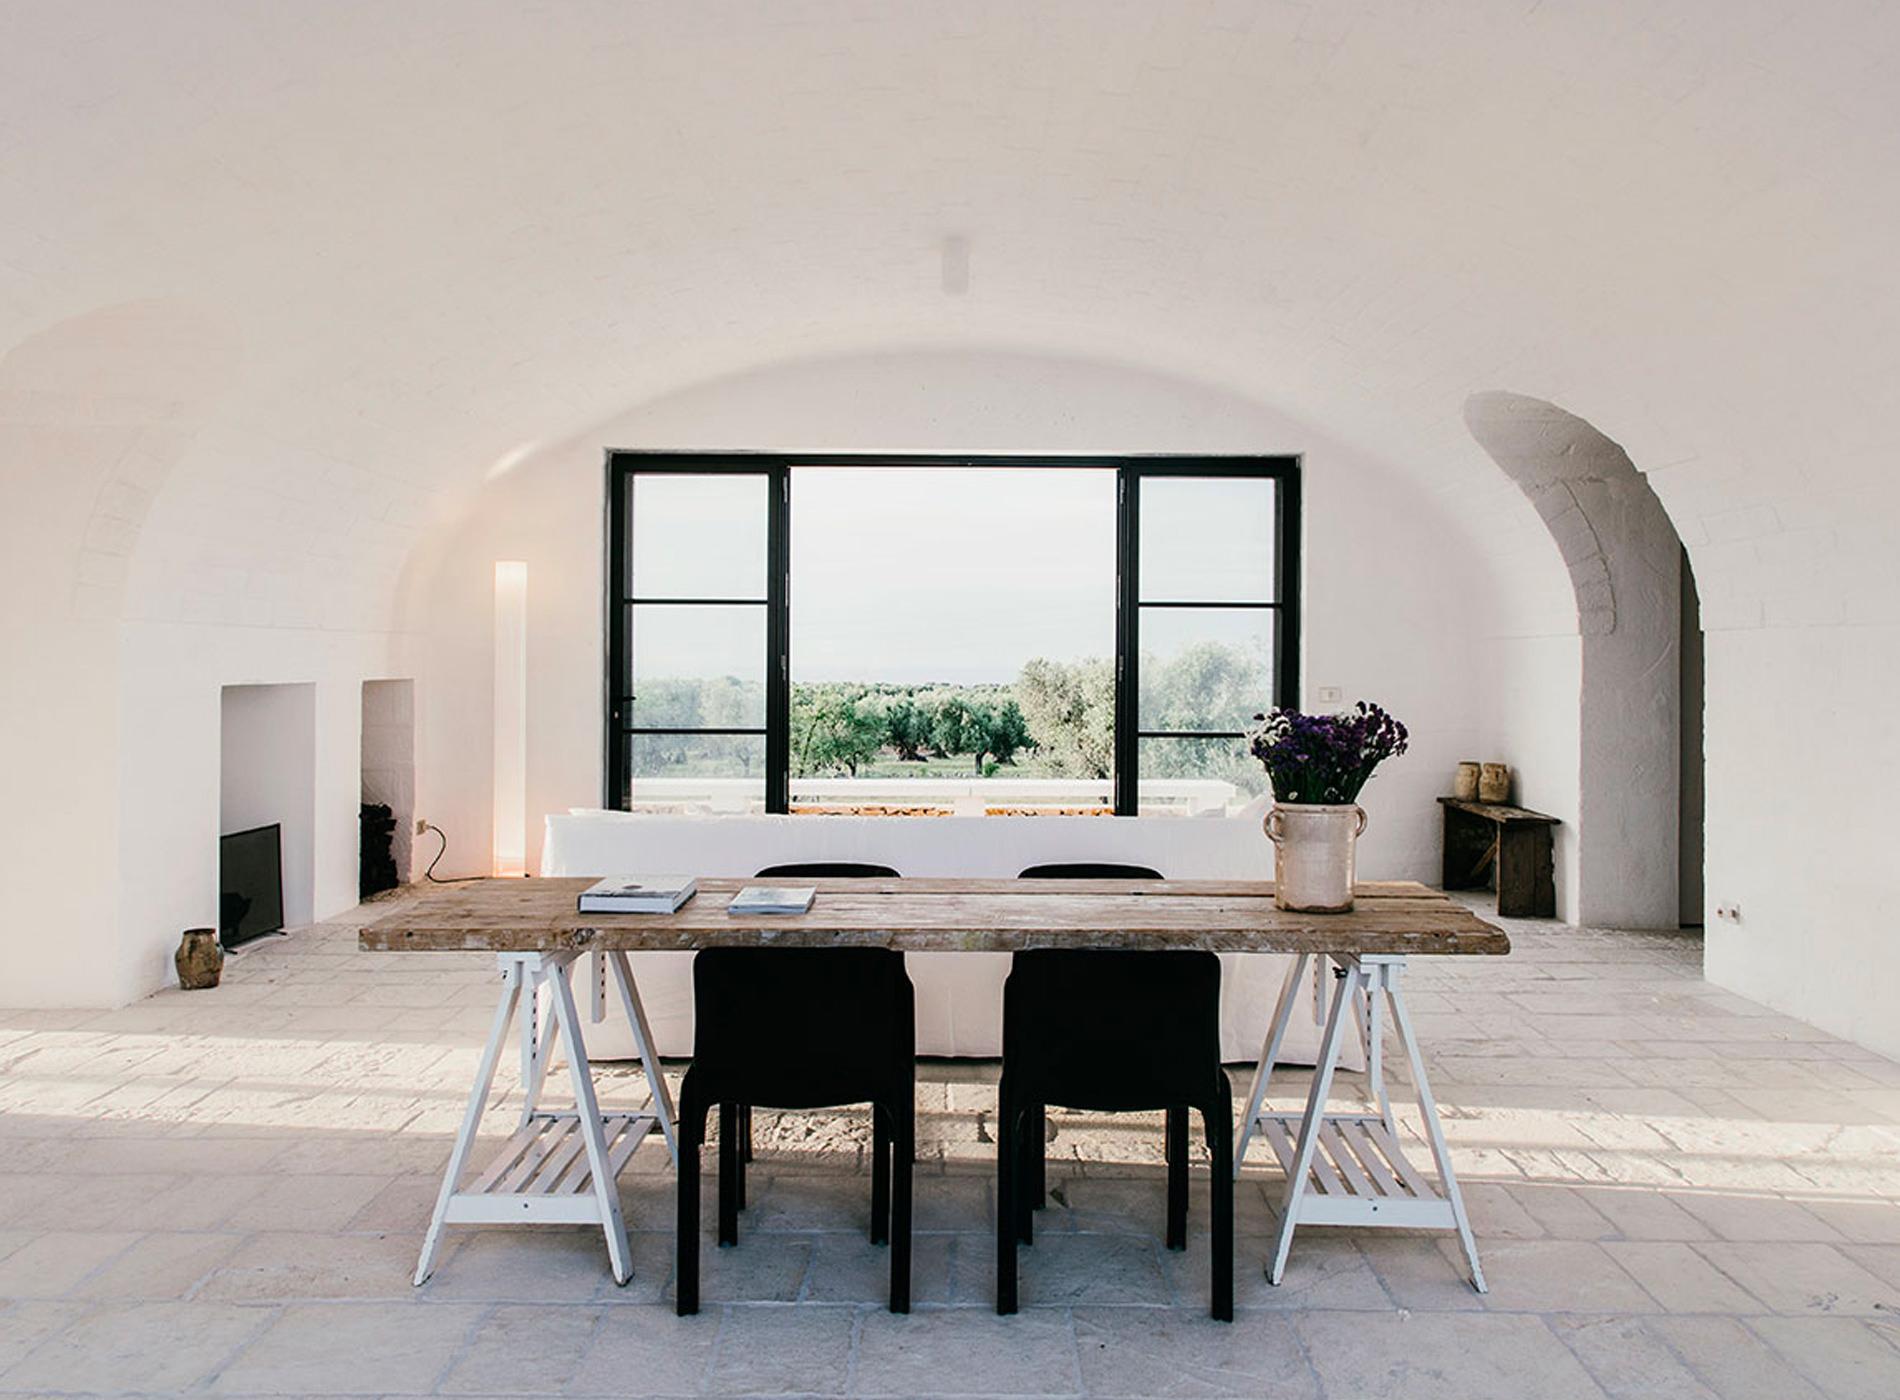 Masseria Moroseta. Ostuni, Province de Brindisi — Les Pouilles Italie